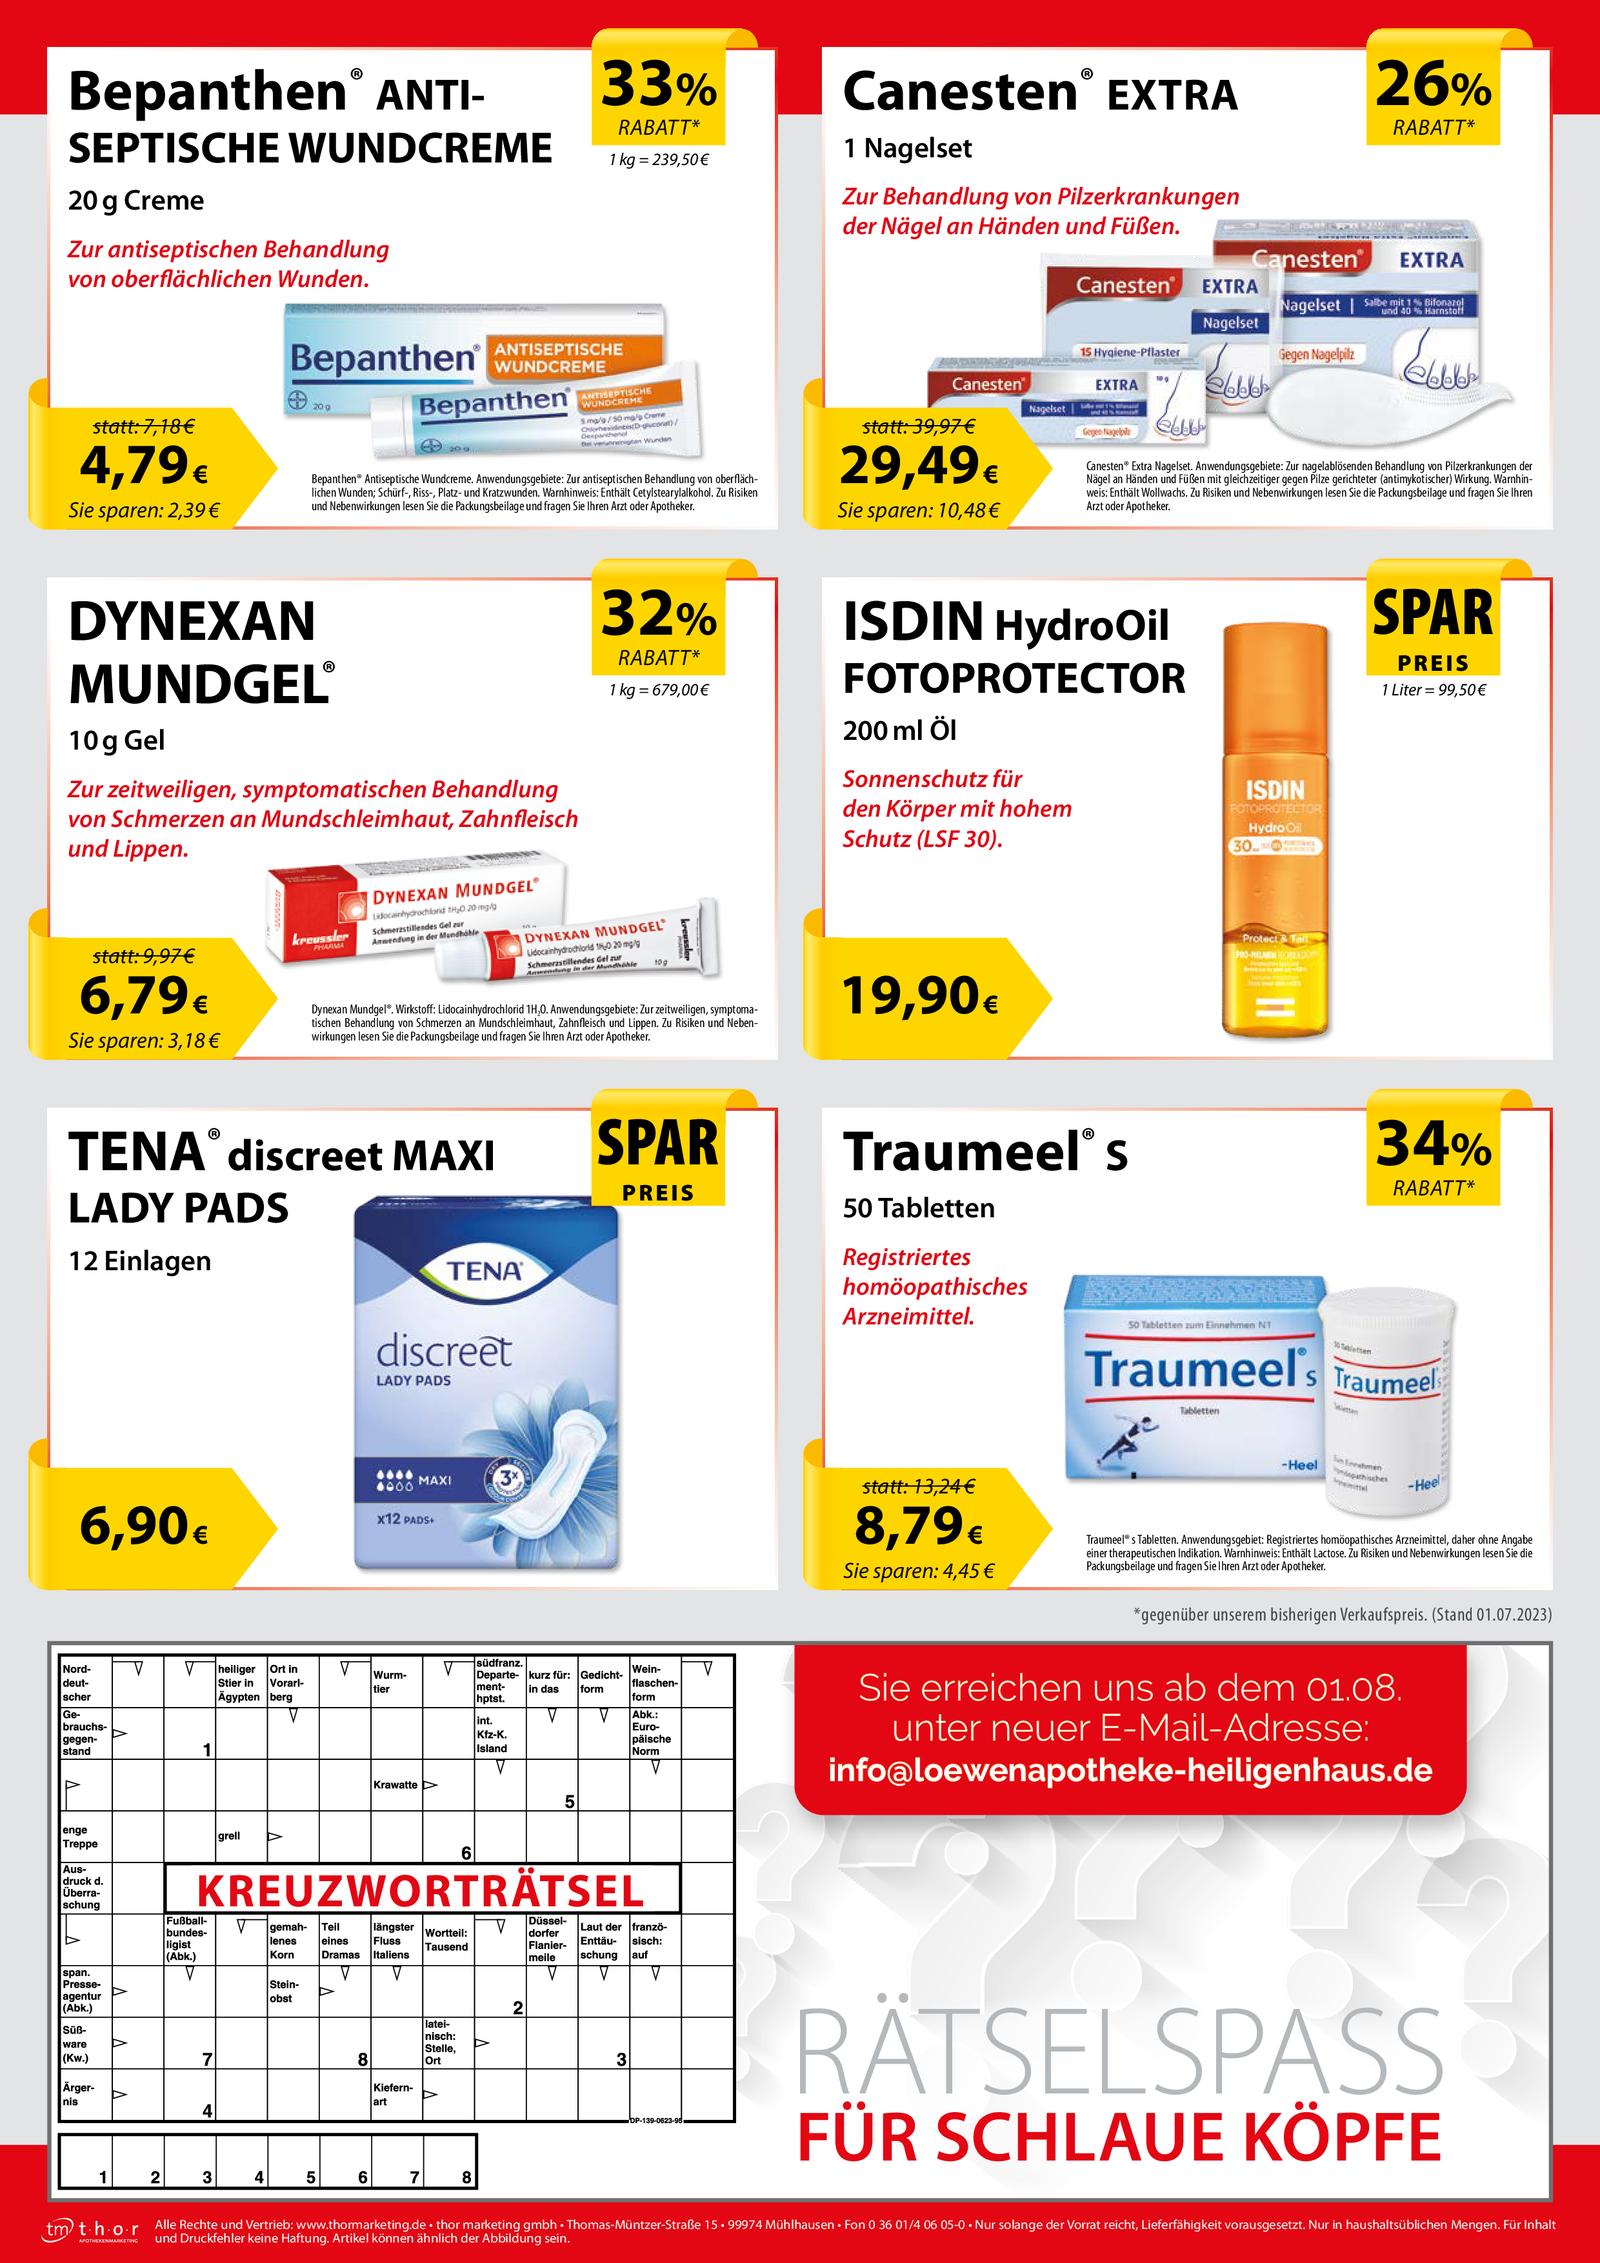 https://mein-uploads.apocdn.net/20392/leaflets/20392_flyer-Seite4.png